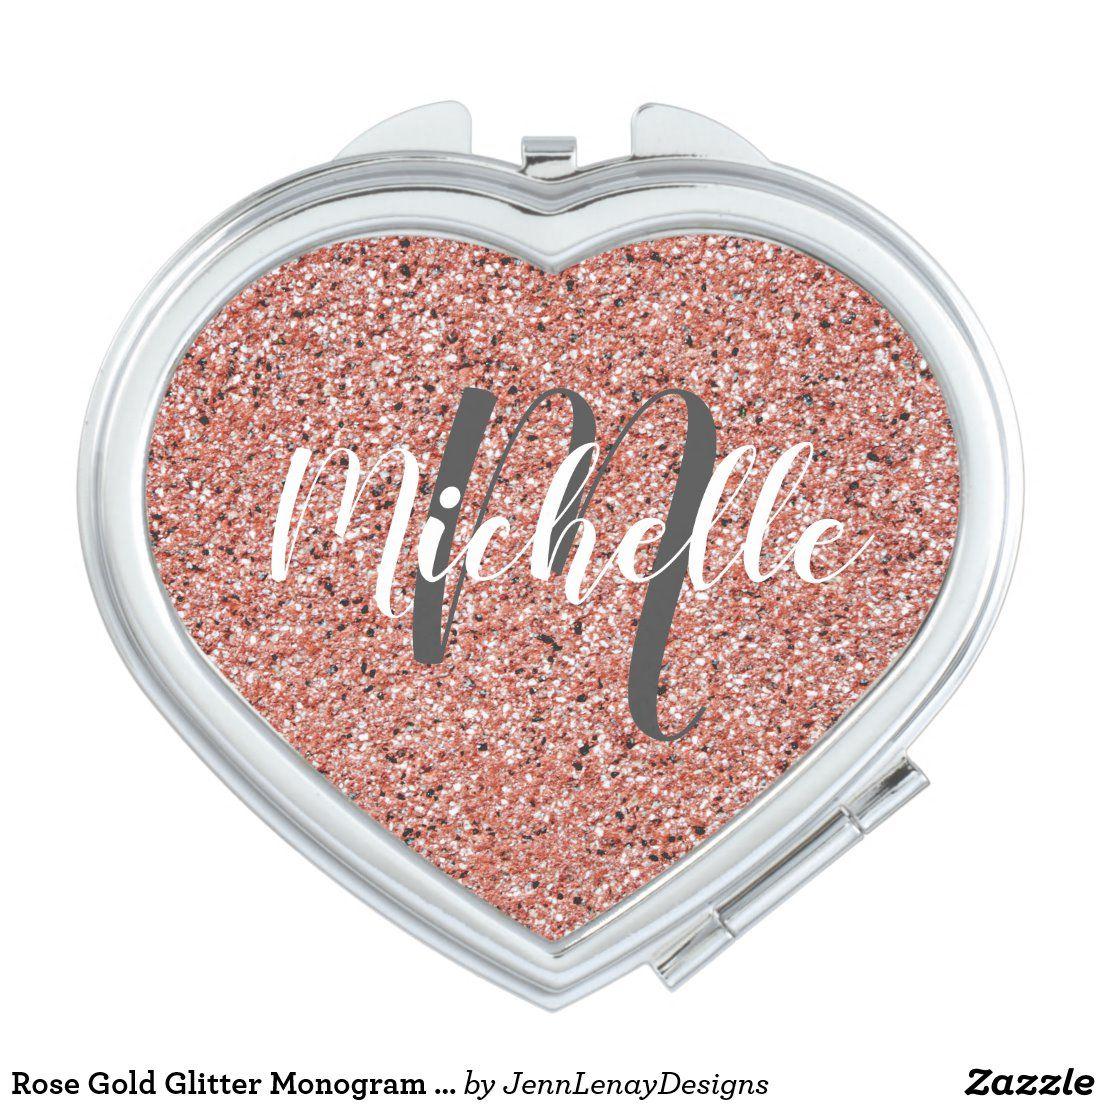 Rose Gold Glitter Monogram Name Cute Heart Compact Mirror | Zazzle.com